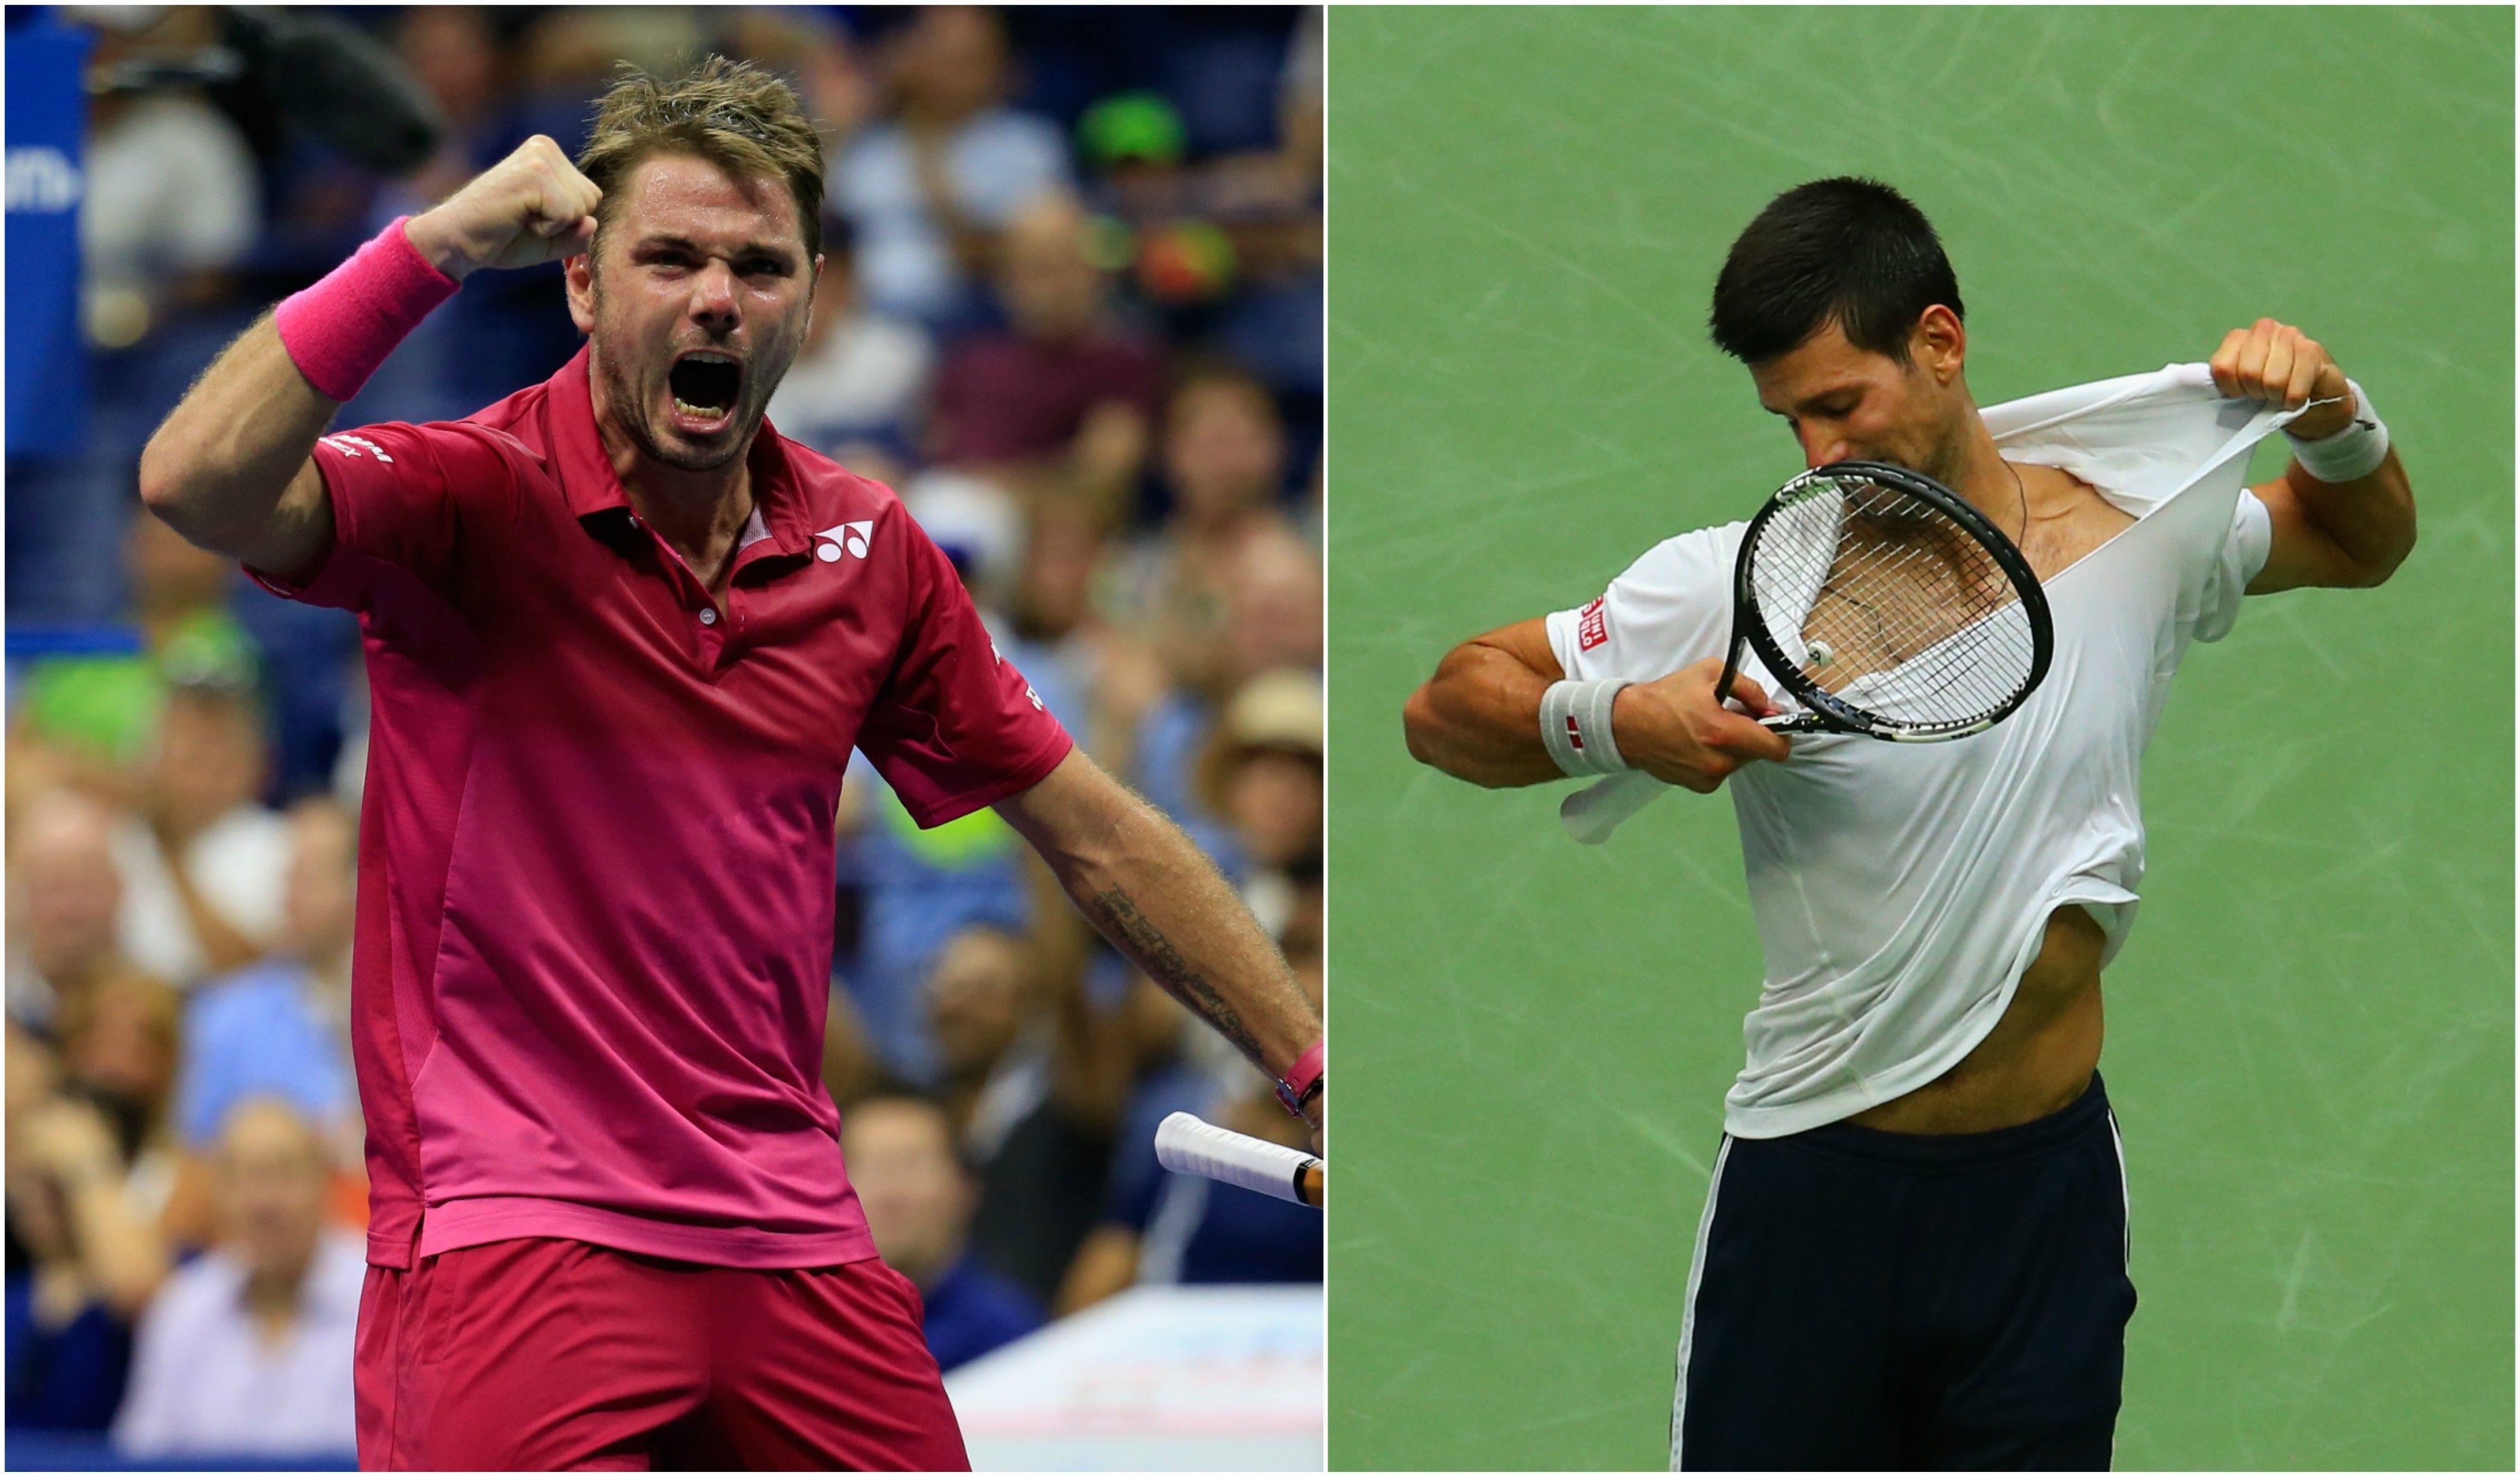 Se dio la lógica: Djokovic ante Wawrinka en la final del US Open